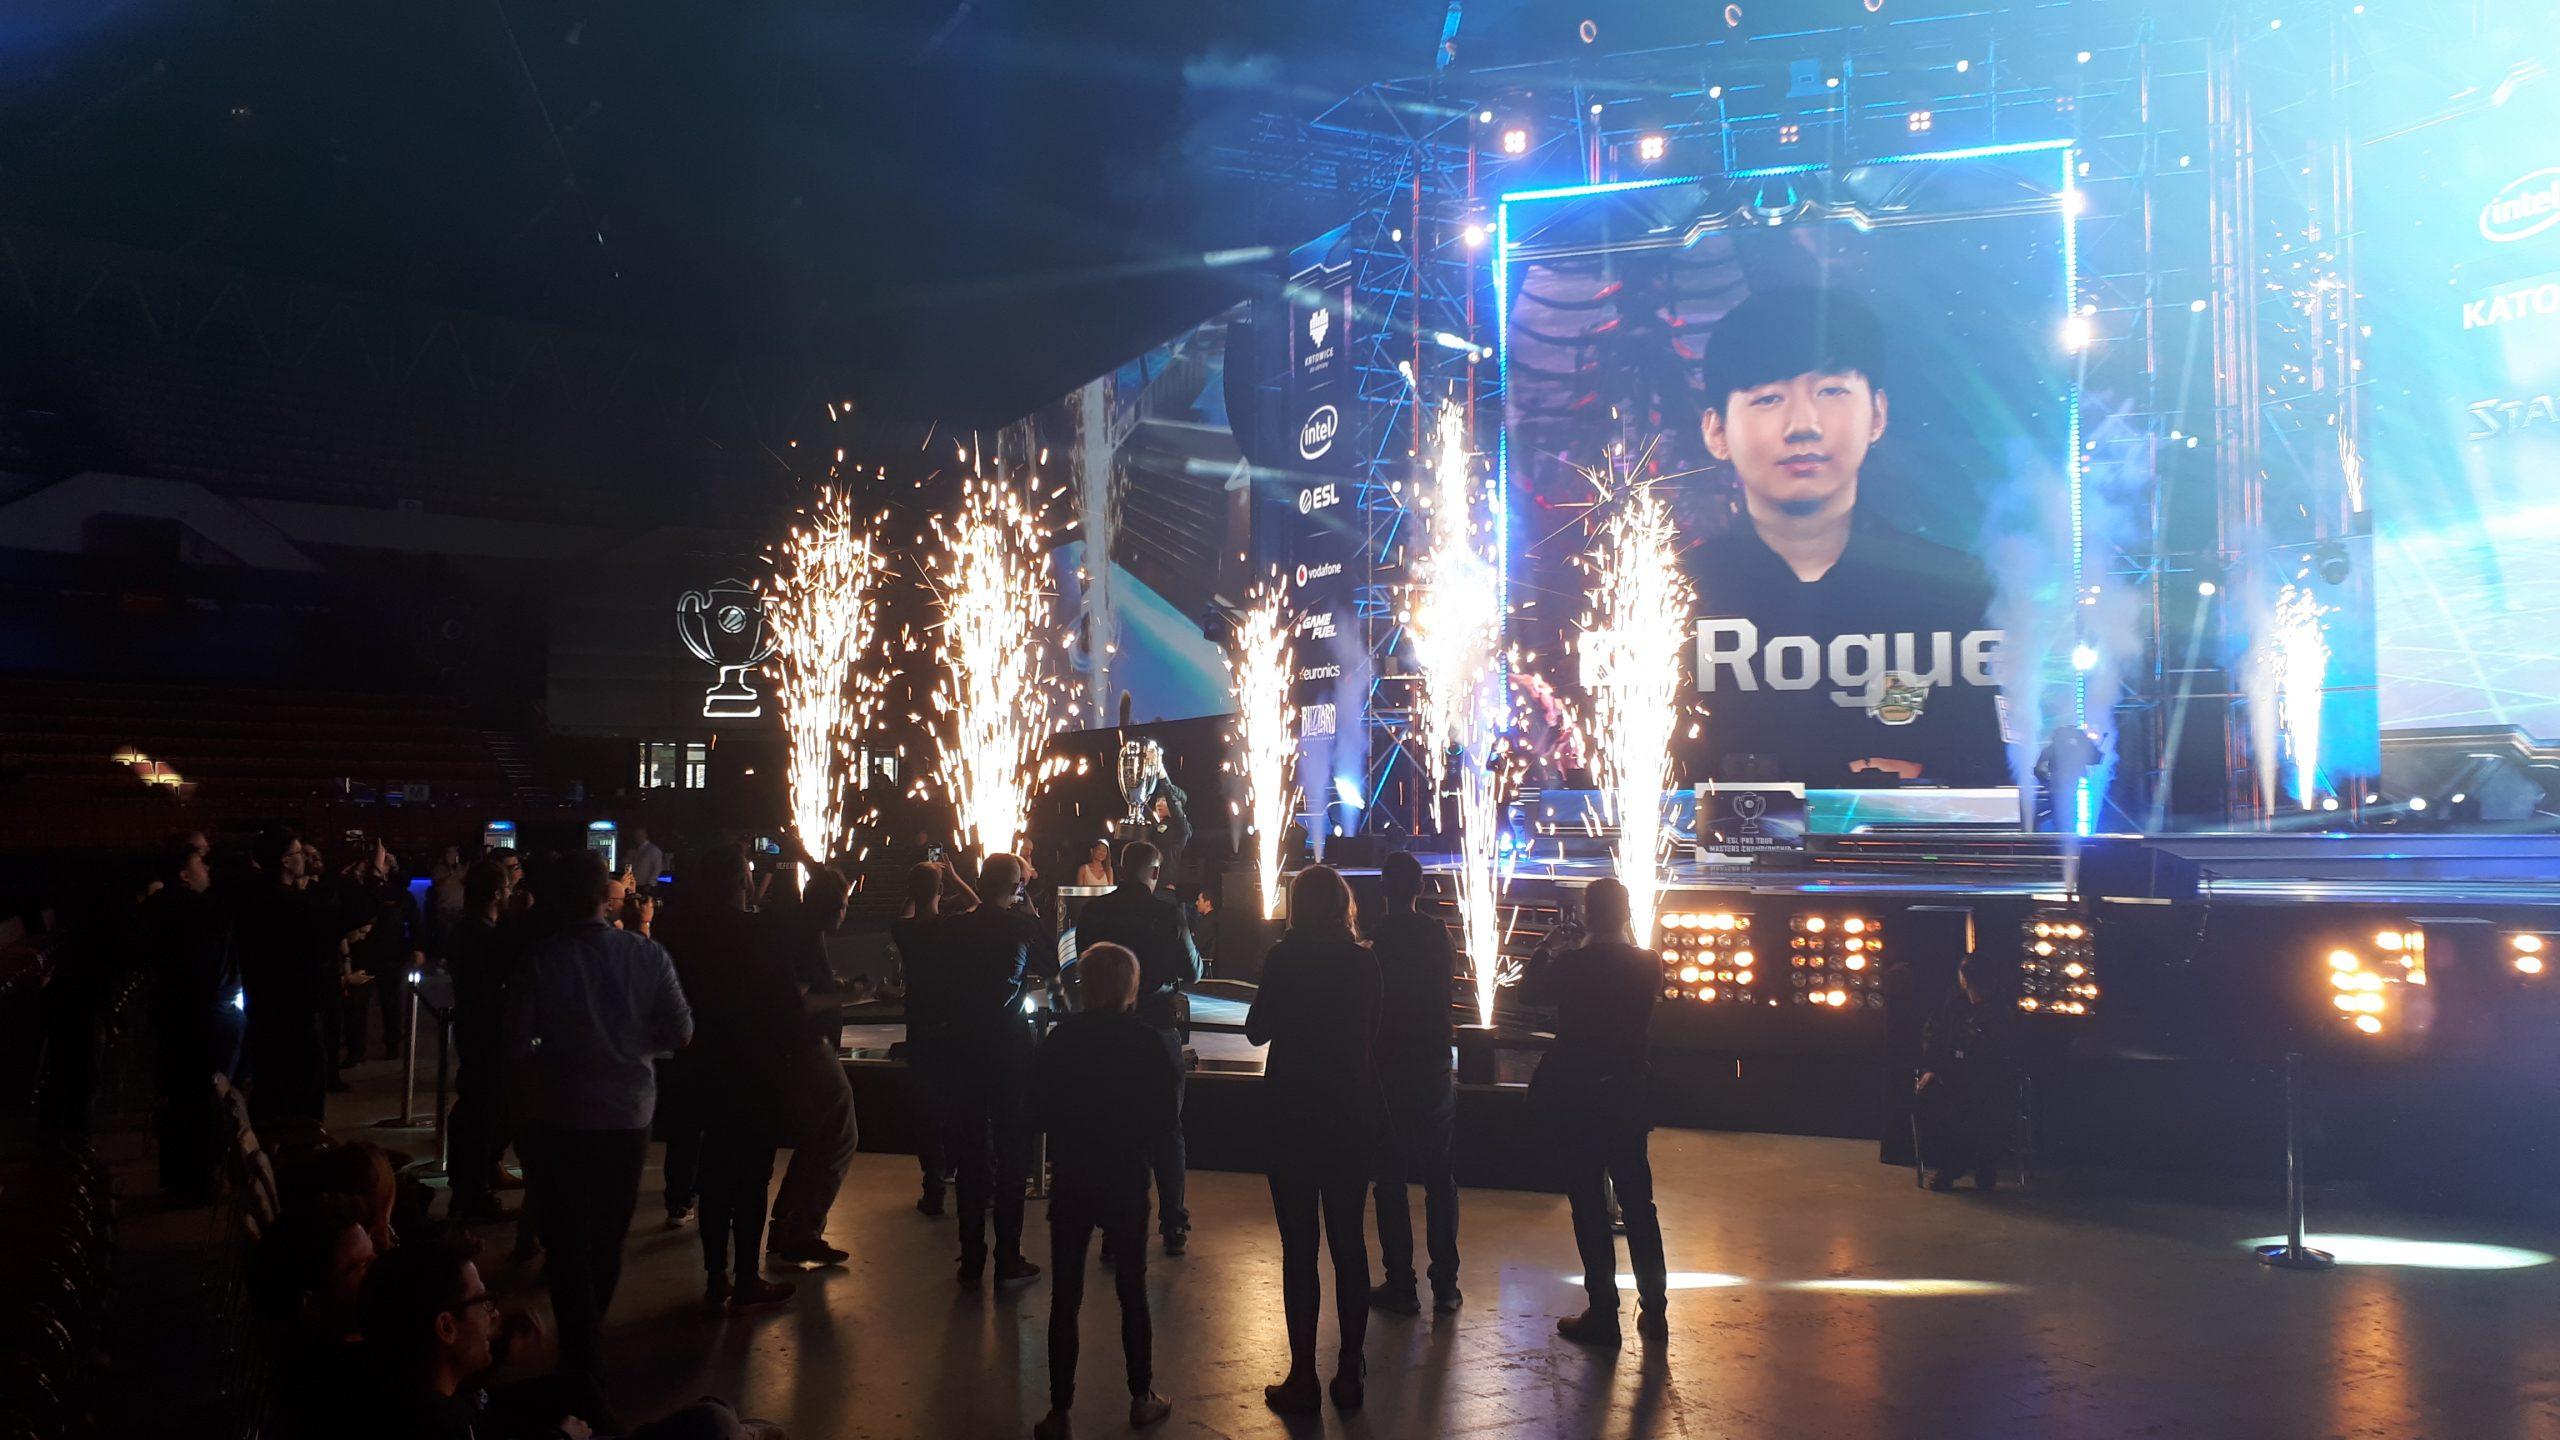 Rogue victorious at IEM Katowice